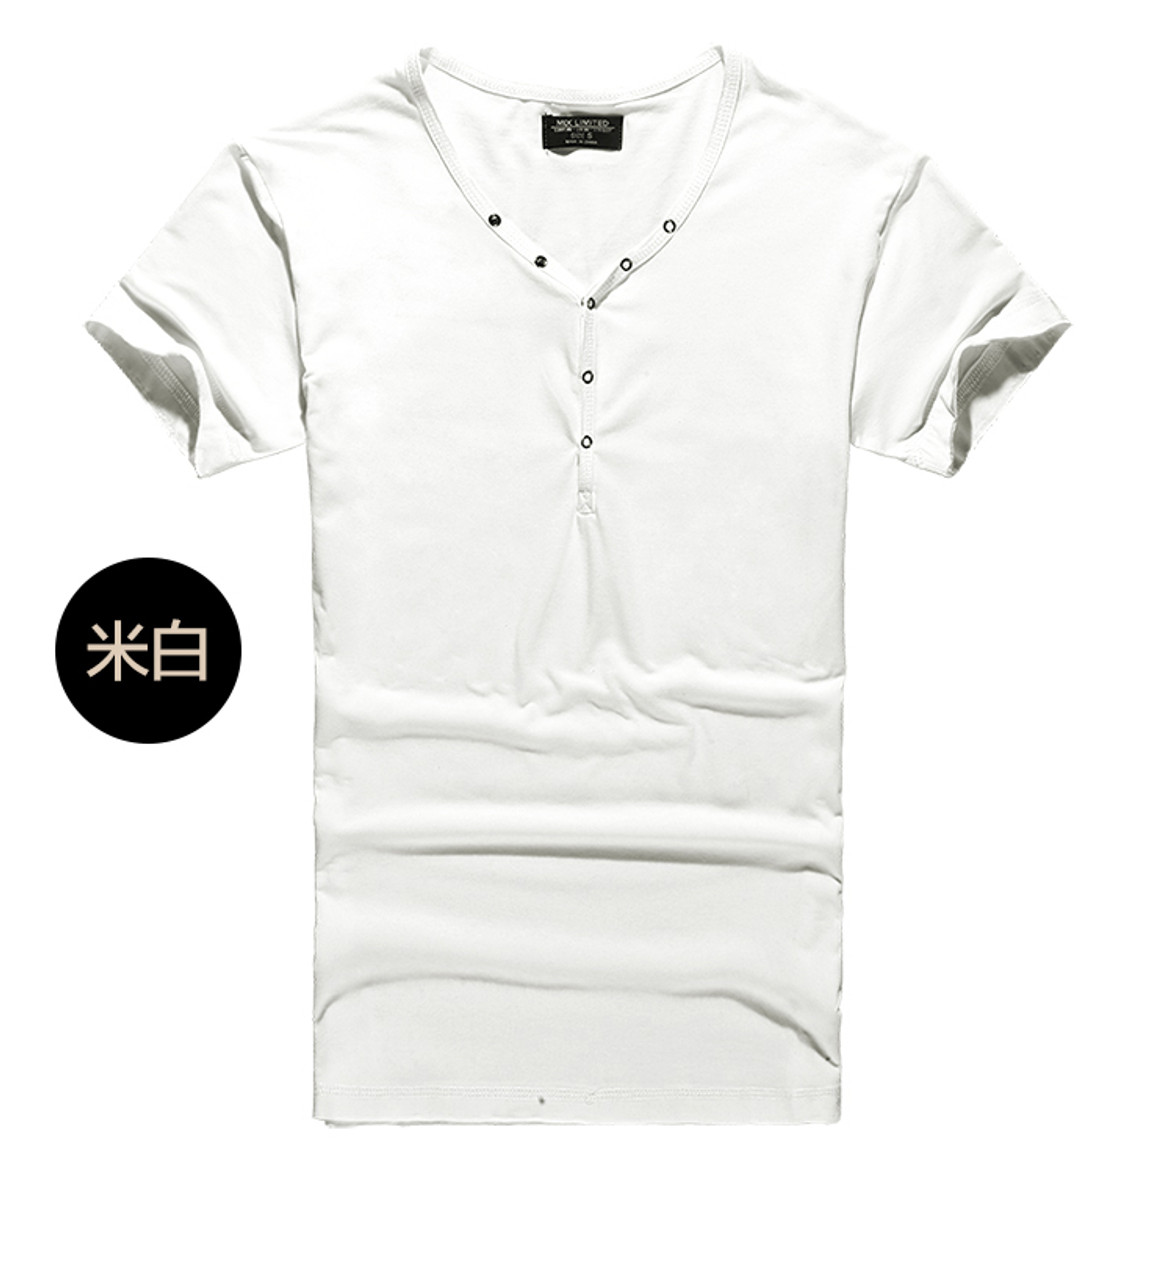 5c4ce507a92 Tops Tees Short Sleeve t-shirt men's brand fashion Slim Fit sexy V neck T  shirt men 2018 New Mens Summer hot sale